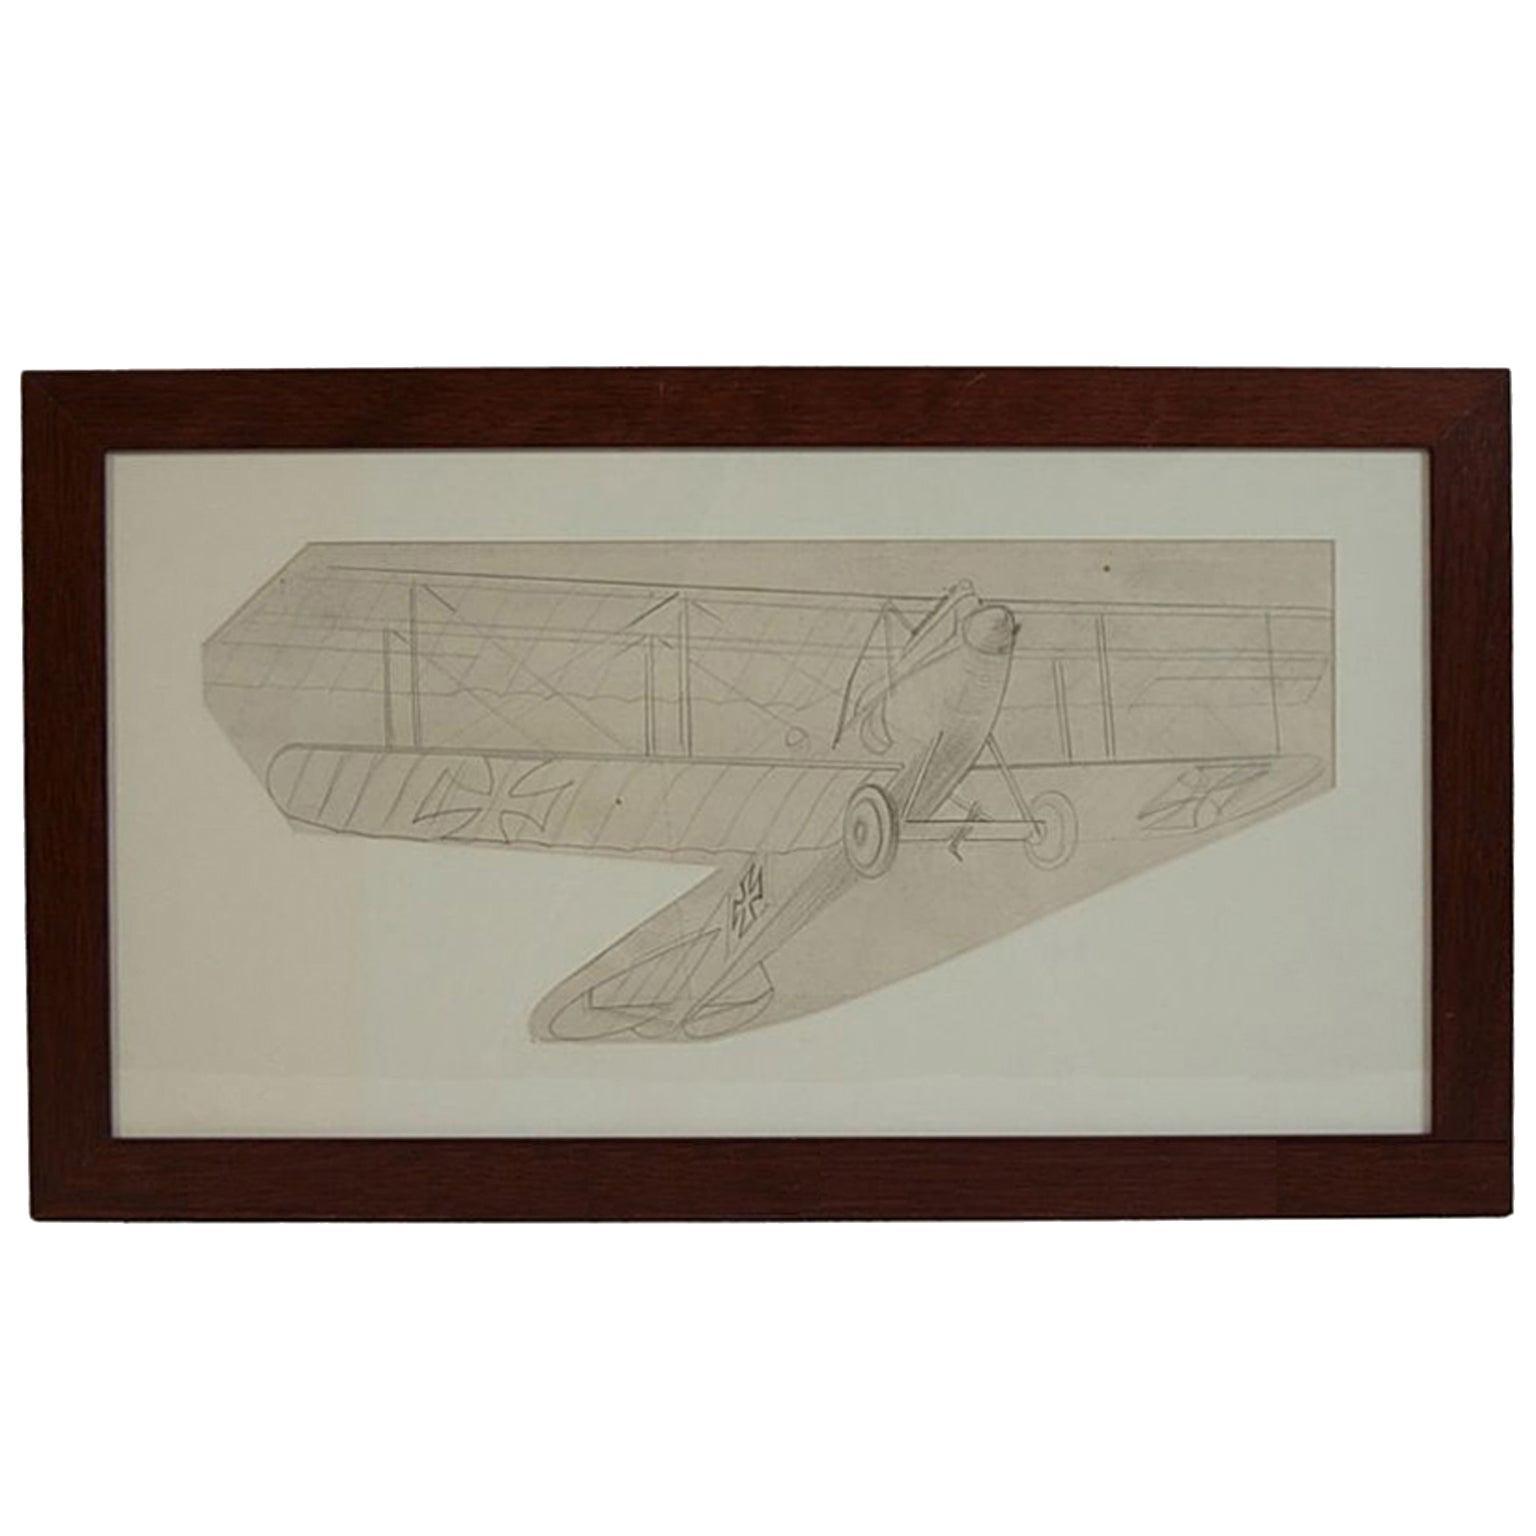 Vintage Original Aviation Pencil Drawing Depicting an Albatros CIII WWI Aircraft